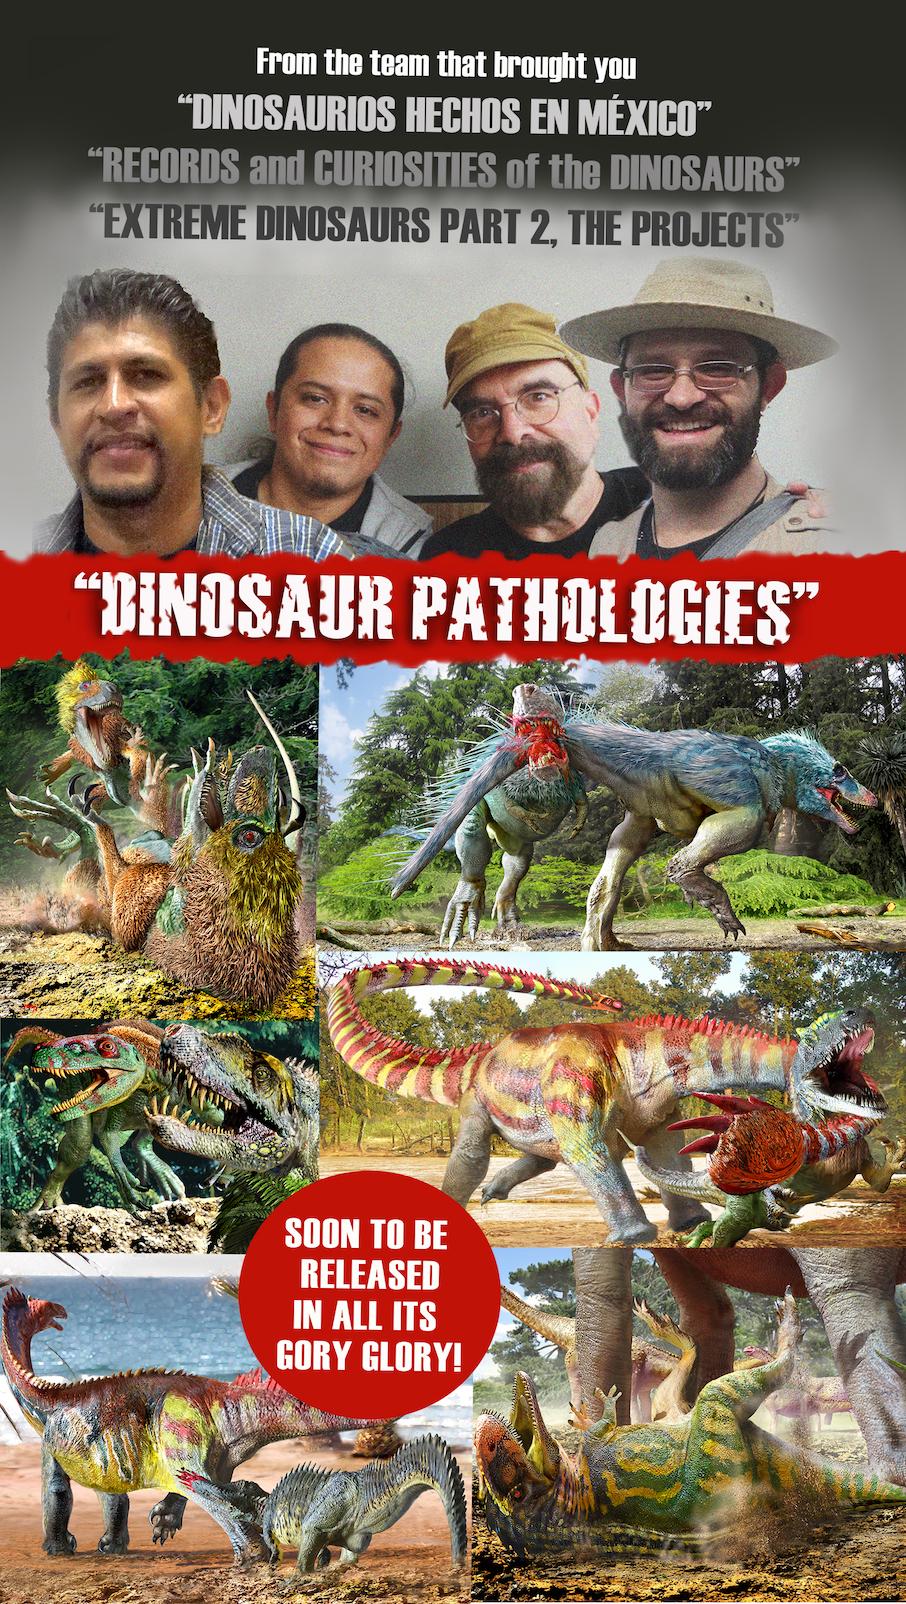 Pathologies teamOK copy.jpg